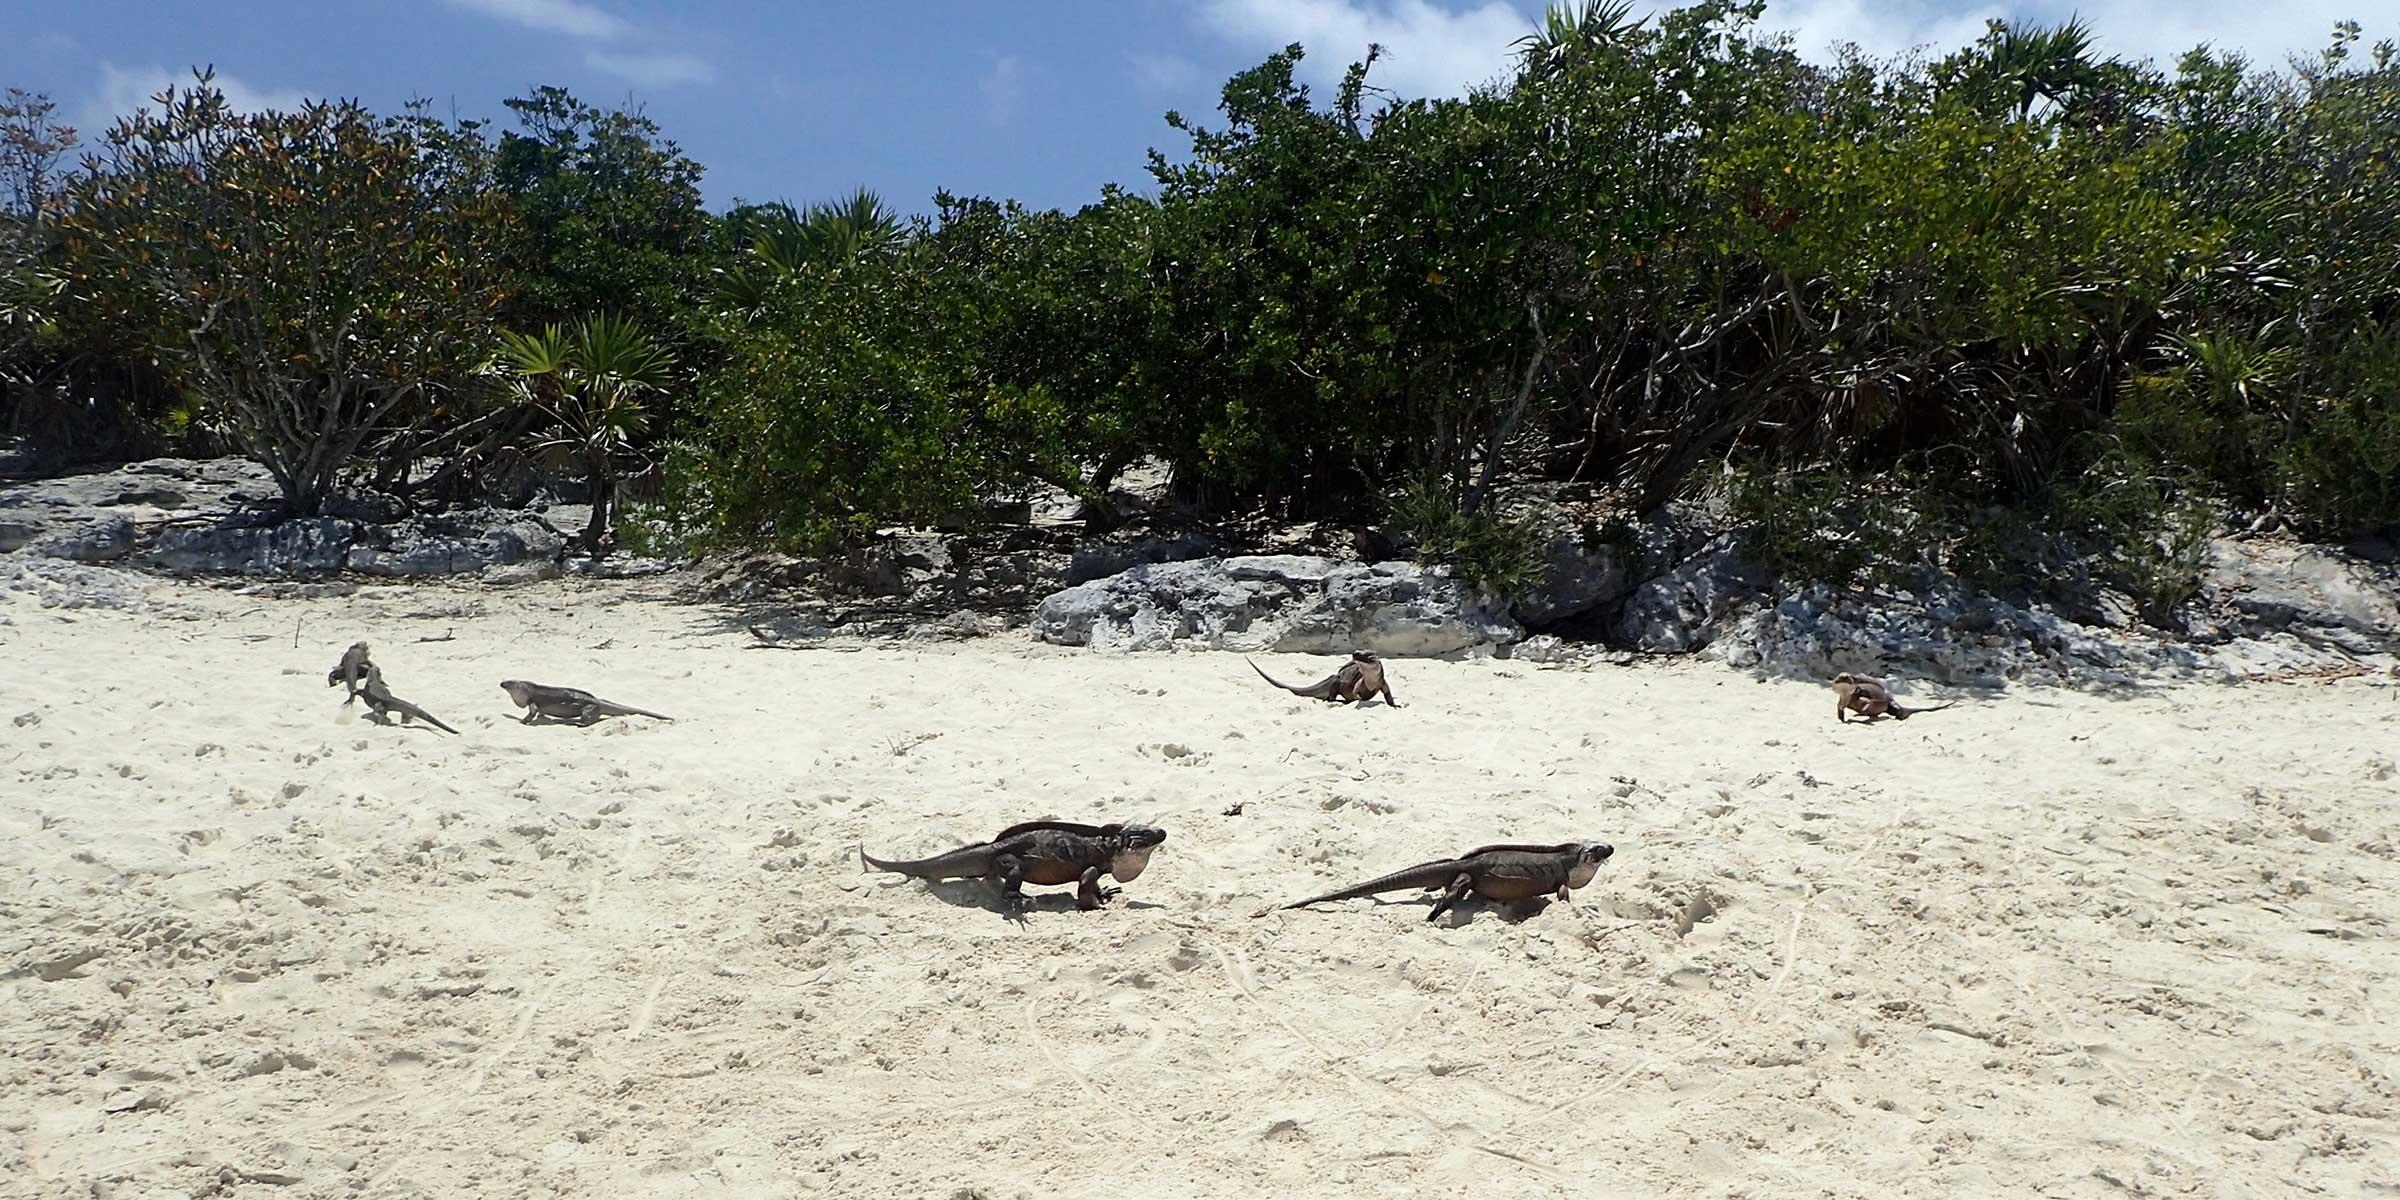 Iguanas on Allan's Cay in the Exumas